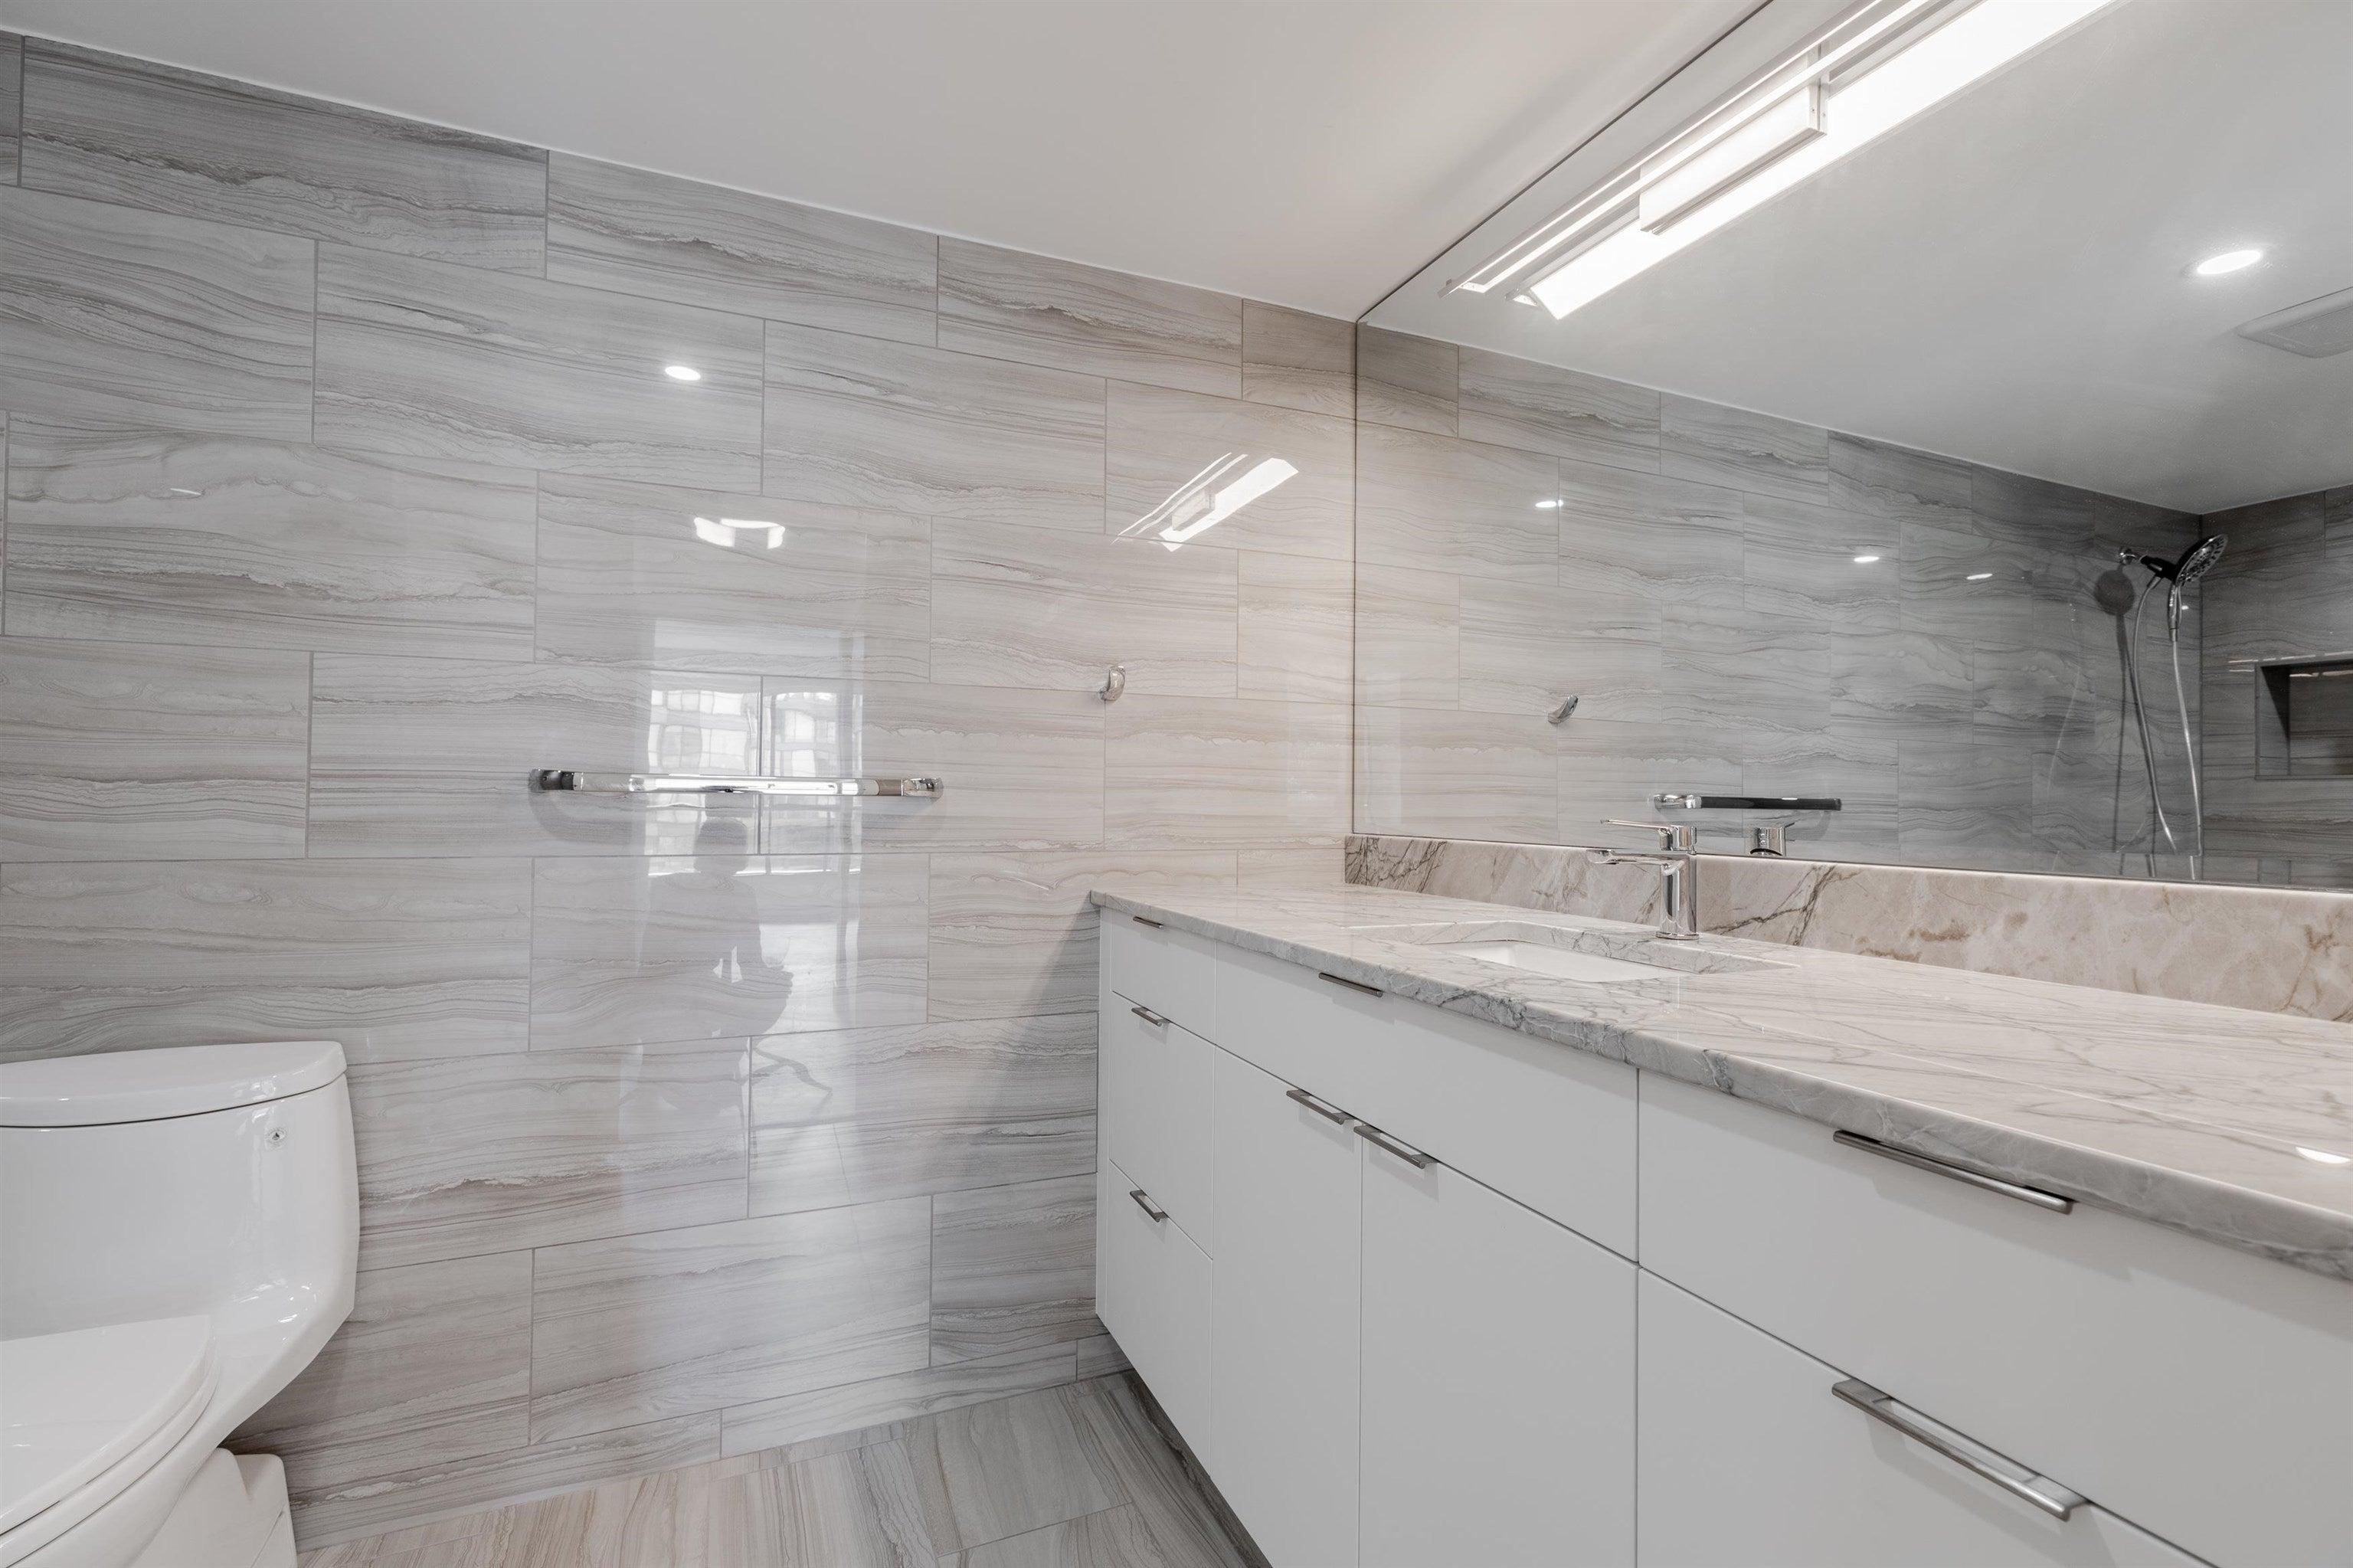 406 1450 PENNYFARTHING DRIVE - False Creek Apartment/Condo for sale, 2 Bedrooms (R2617259) - #23